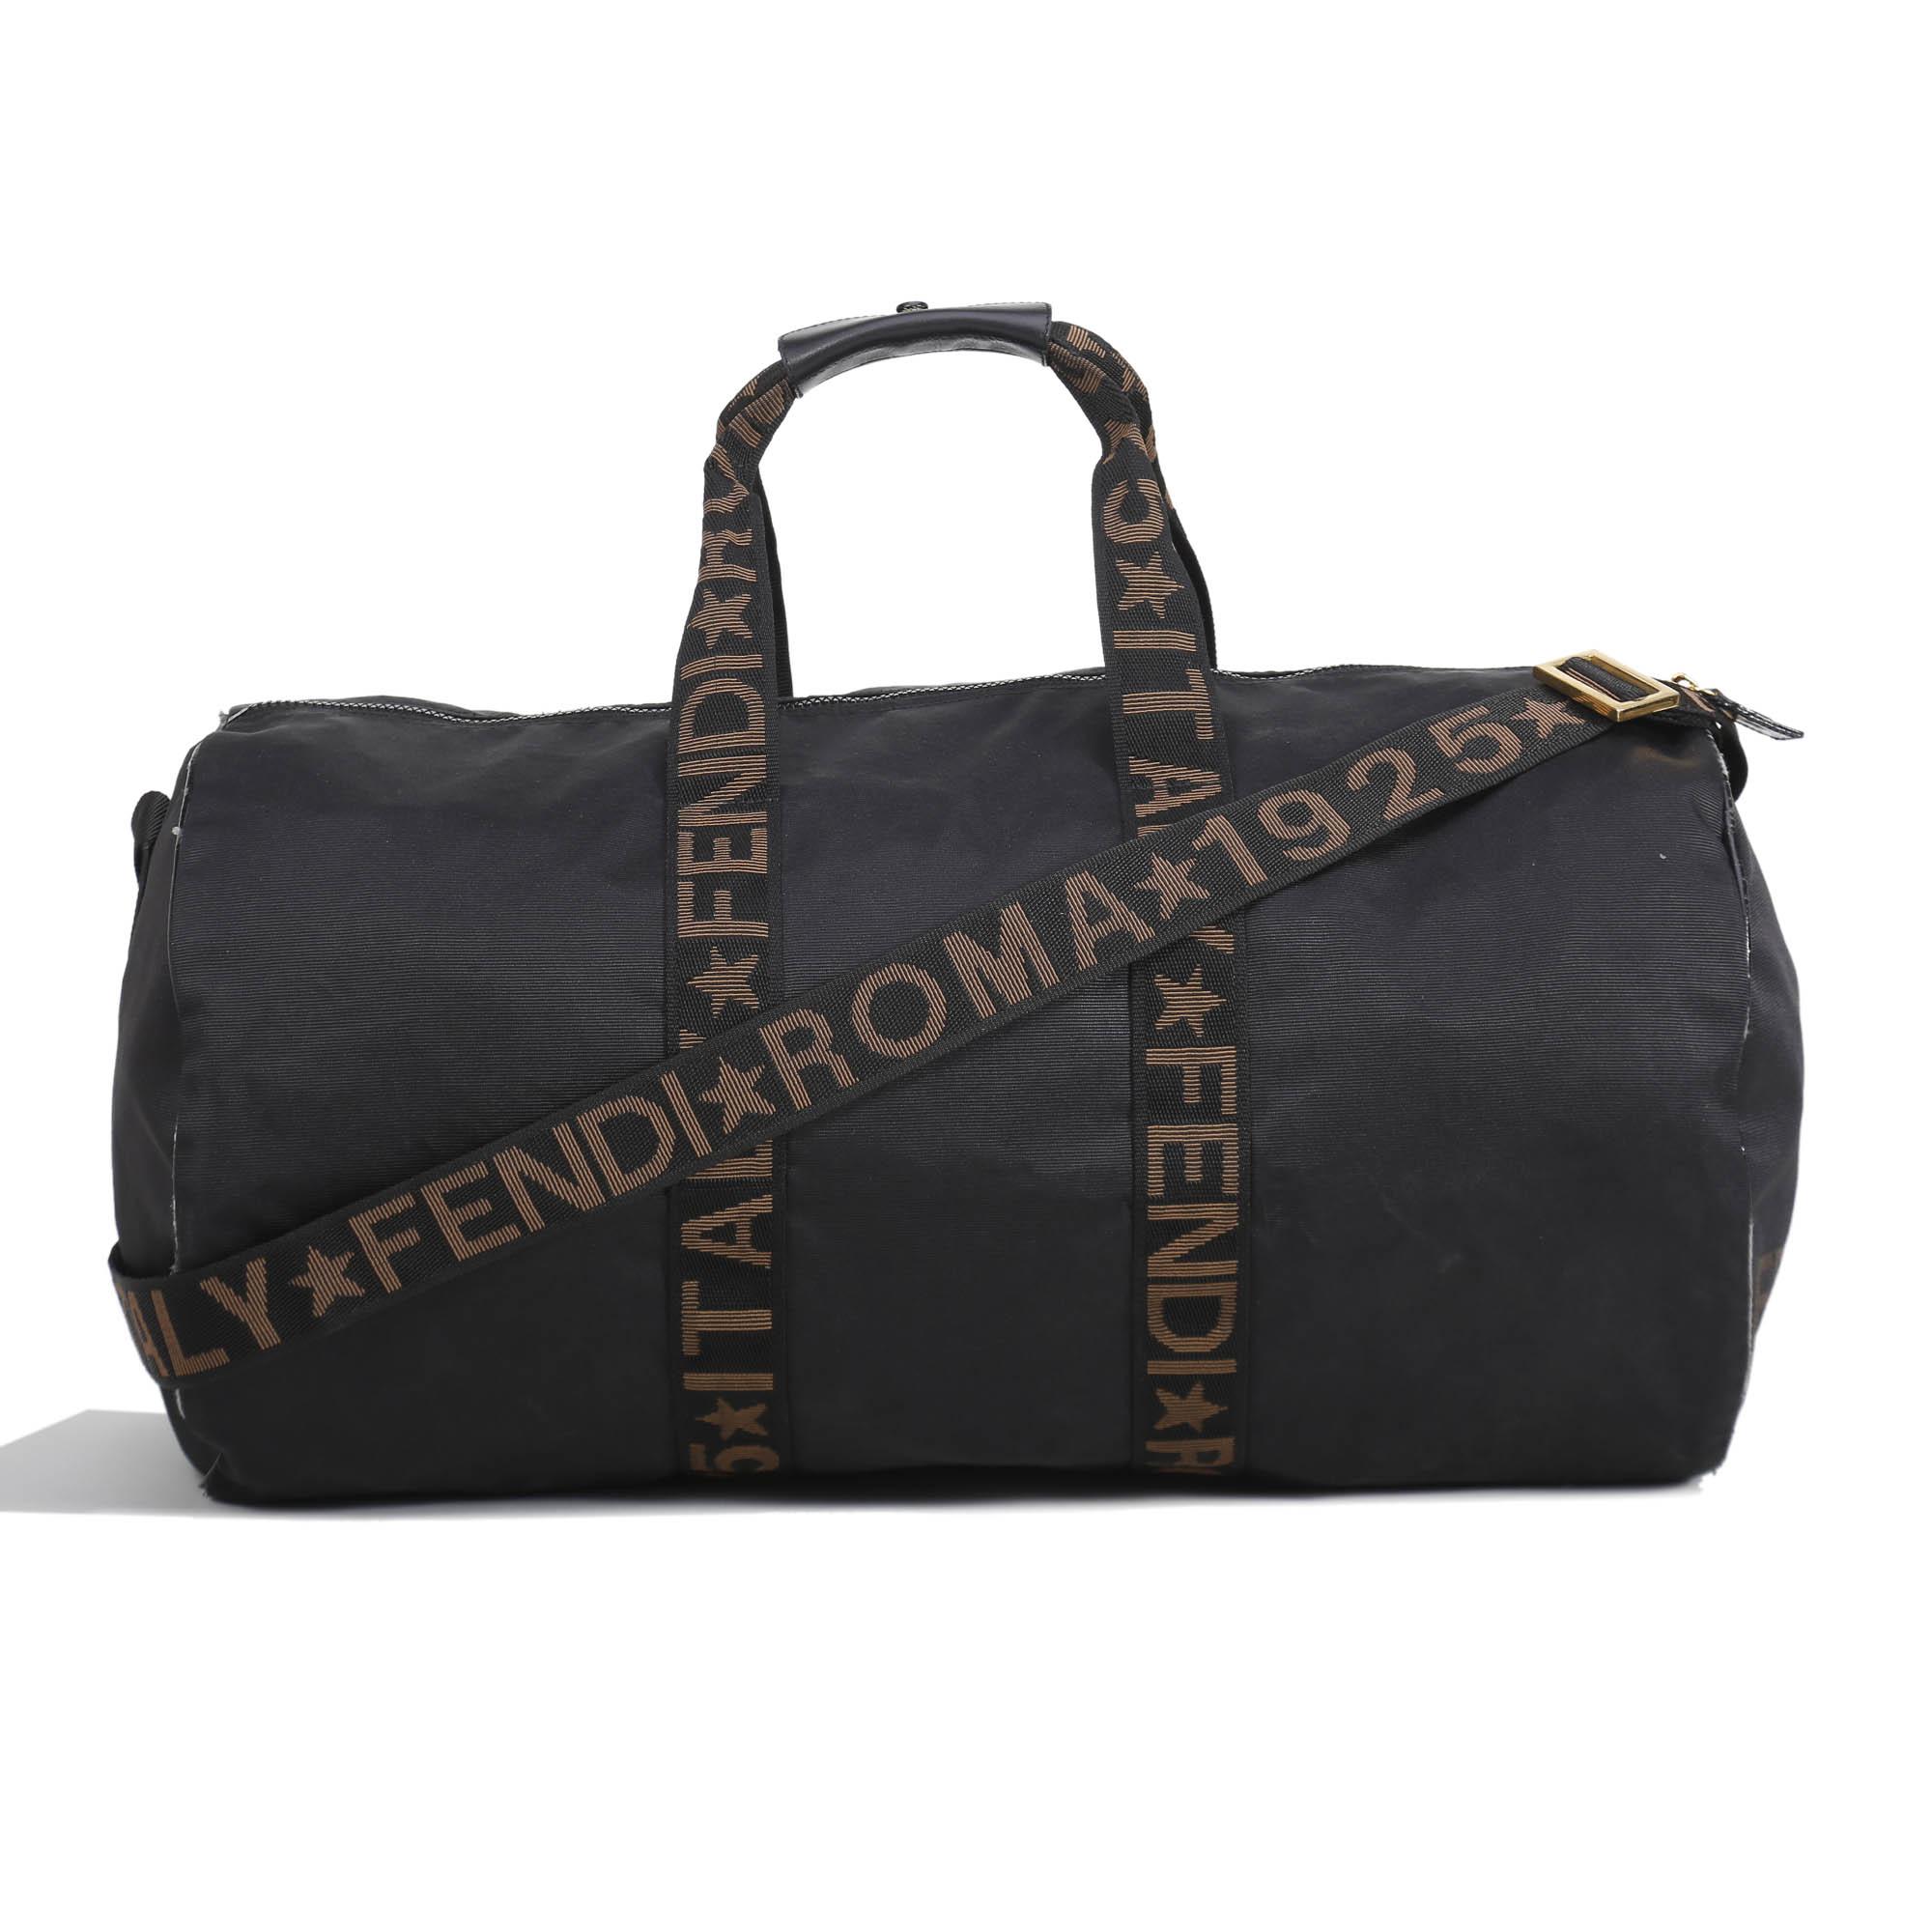 ab389050bc order travel bags bags fendi a2450 9e4de  official store fendi black nylon  carry on travel bag 239ea 8849b